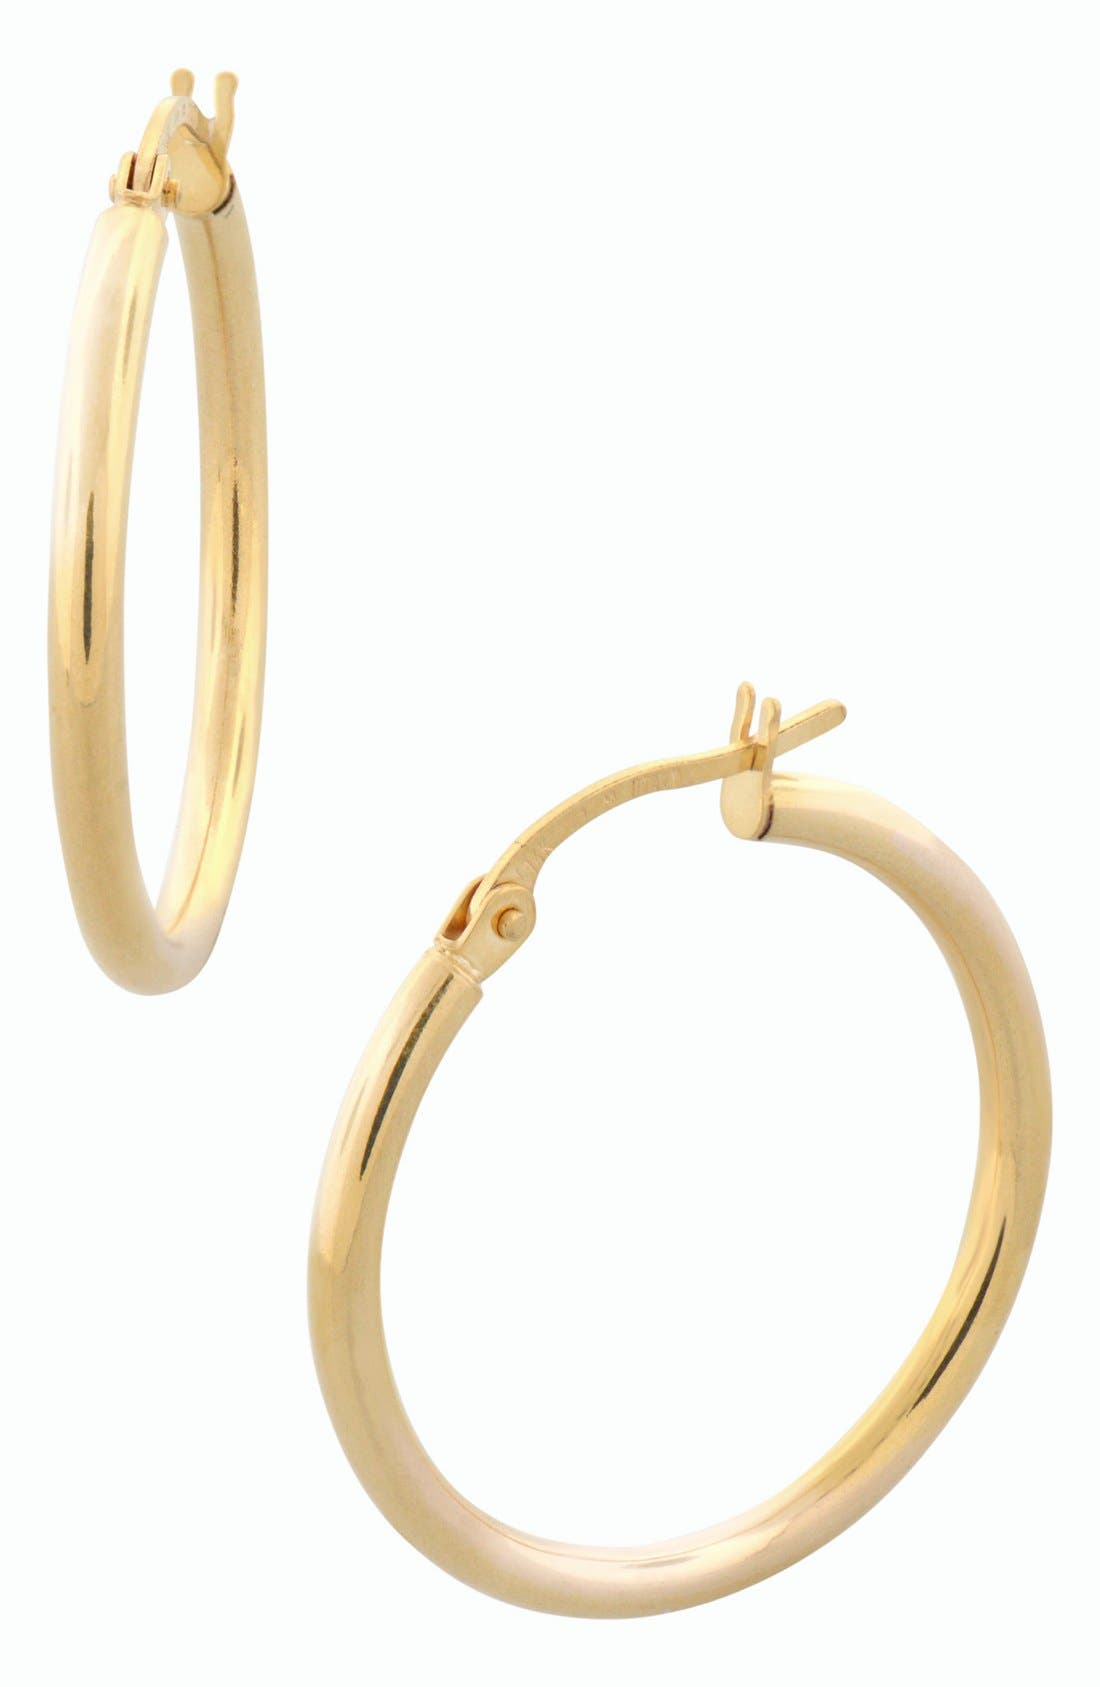 14k Gold Hoop Earrings,                             Main thumbnail 1, color,                             YELLOW GOLD